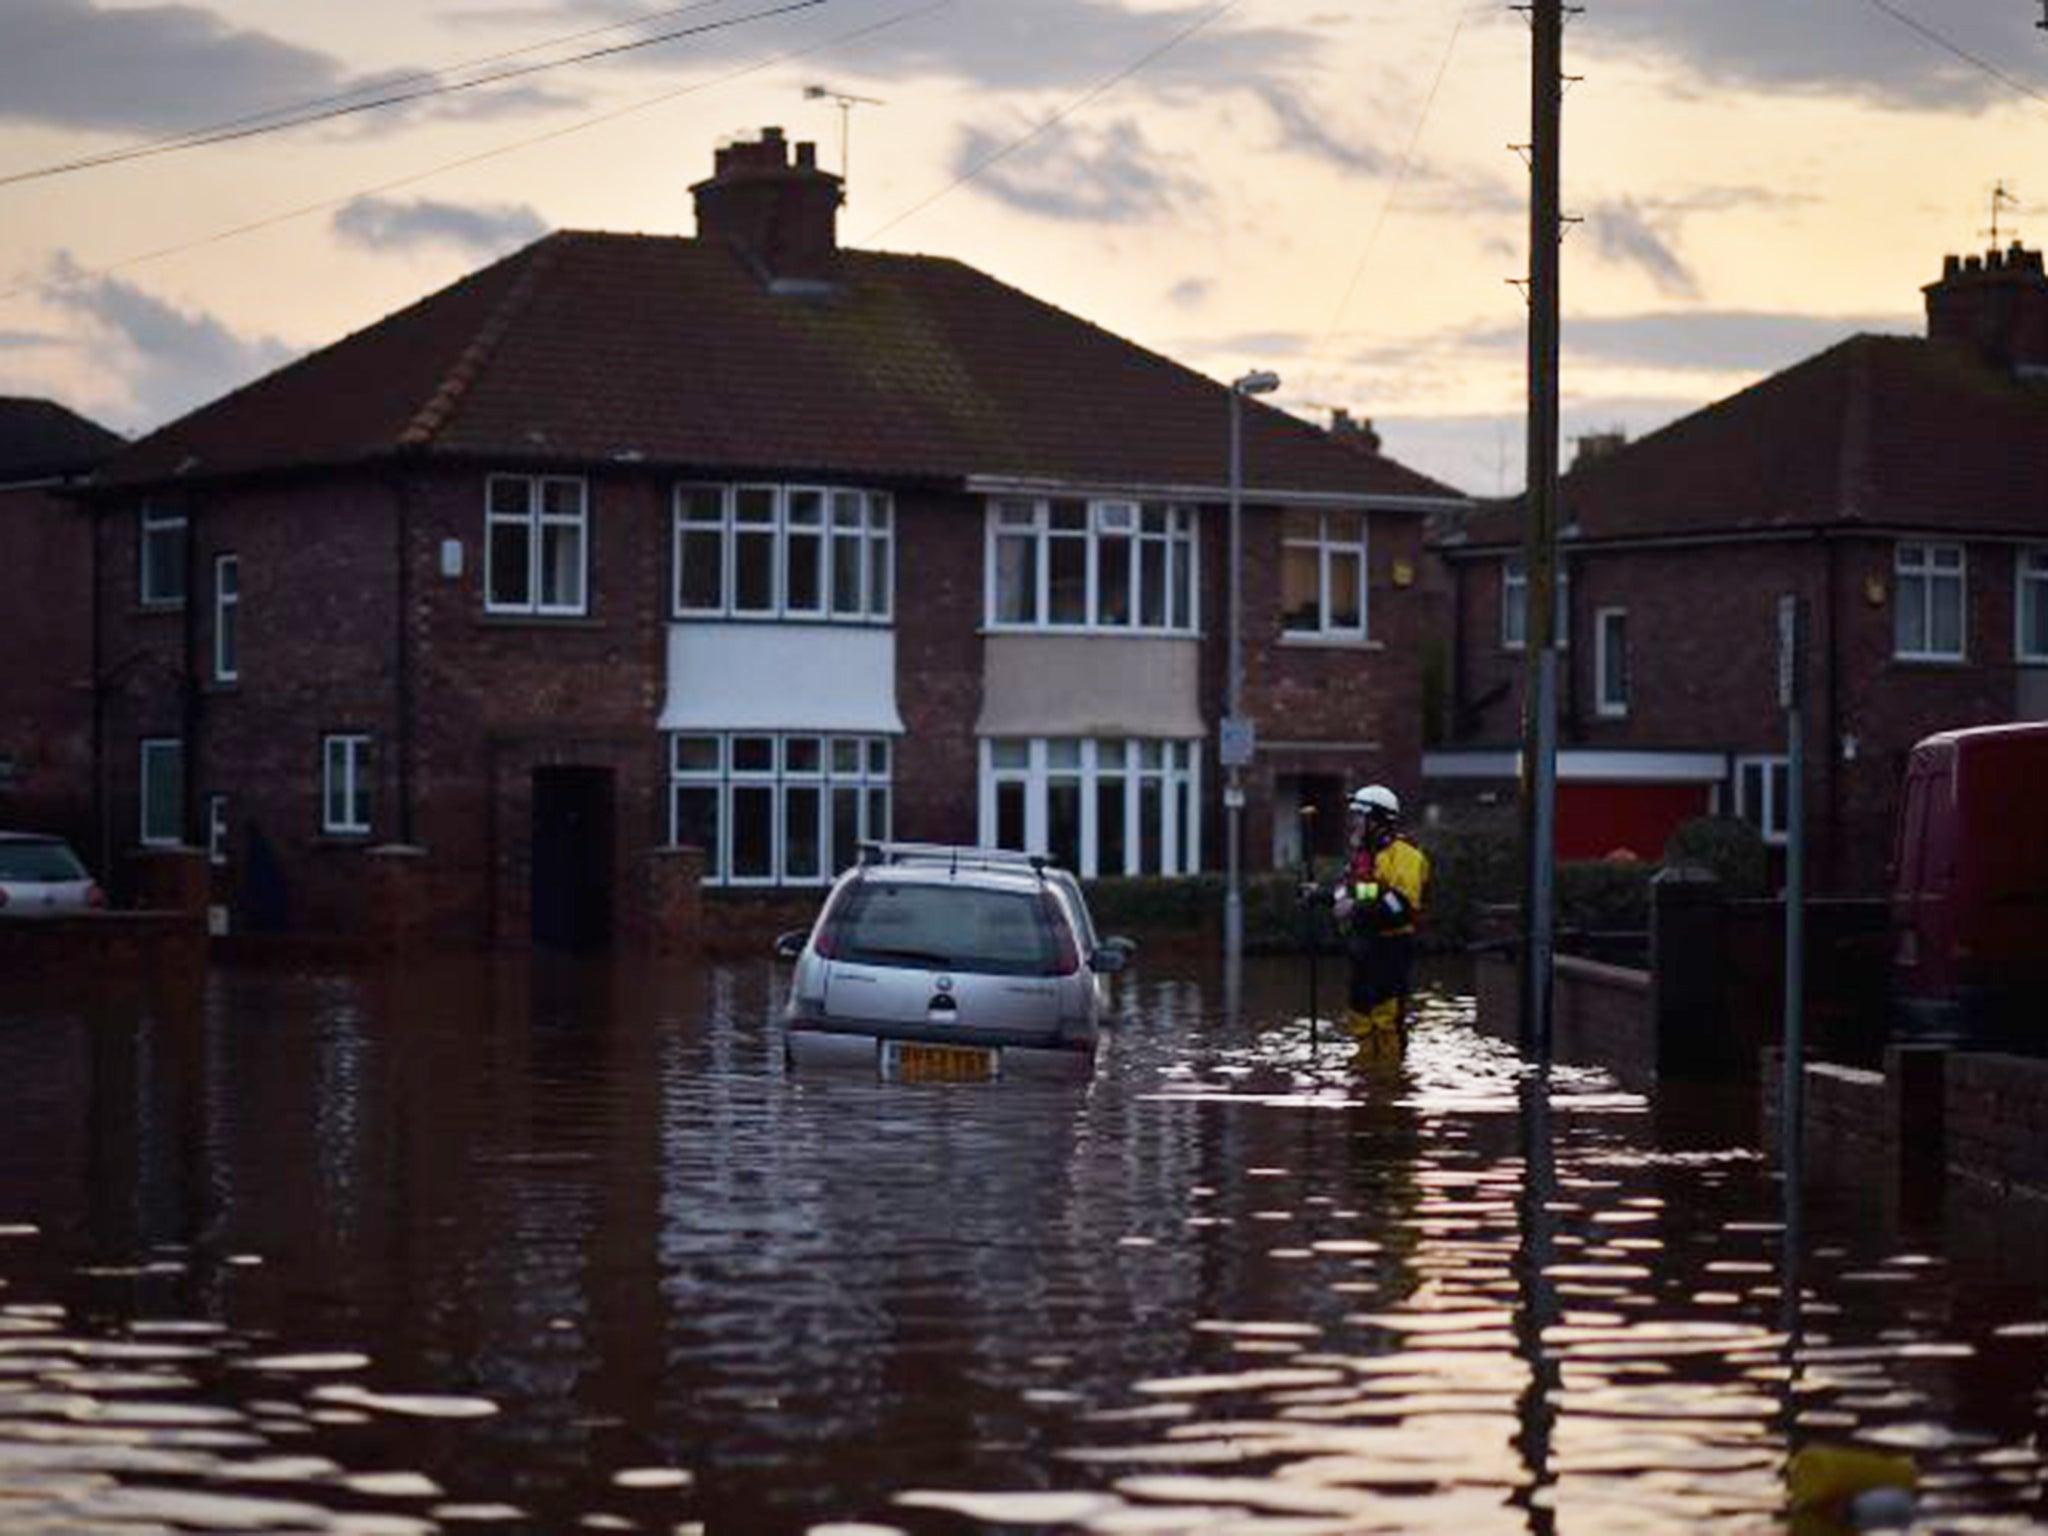 cumbria flood bride battles - HD2048×1536